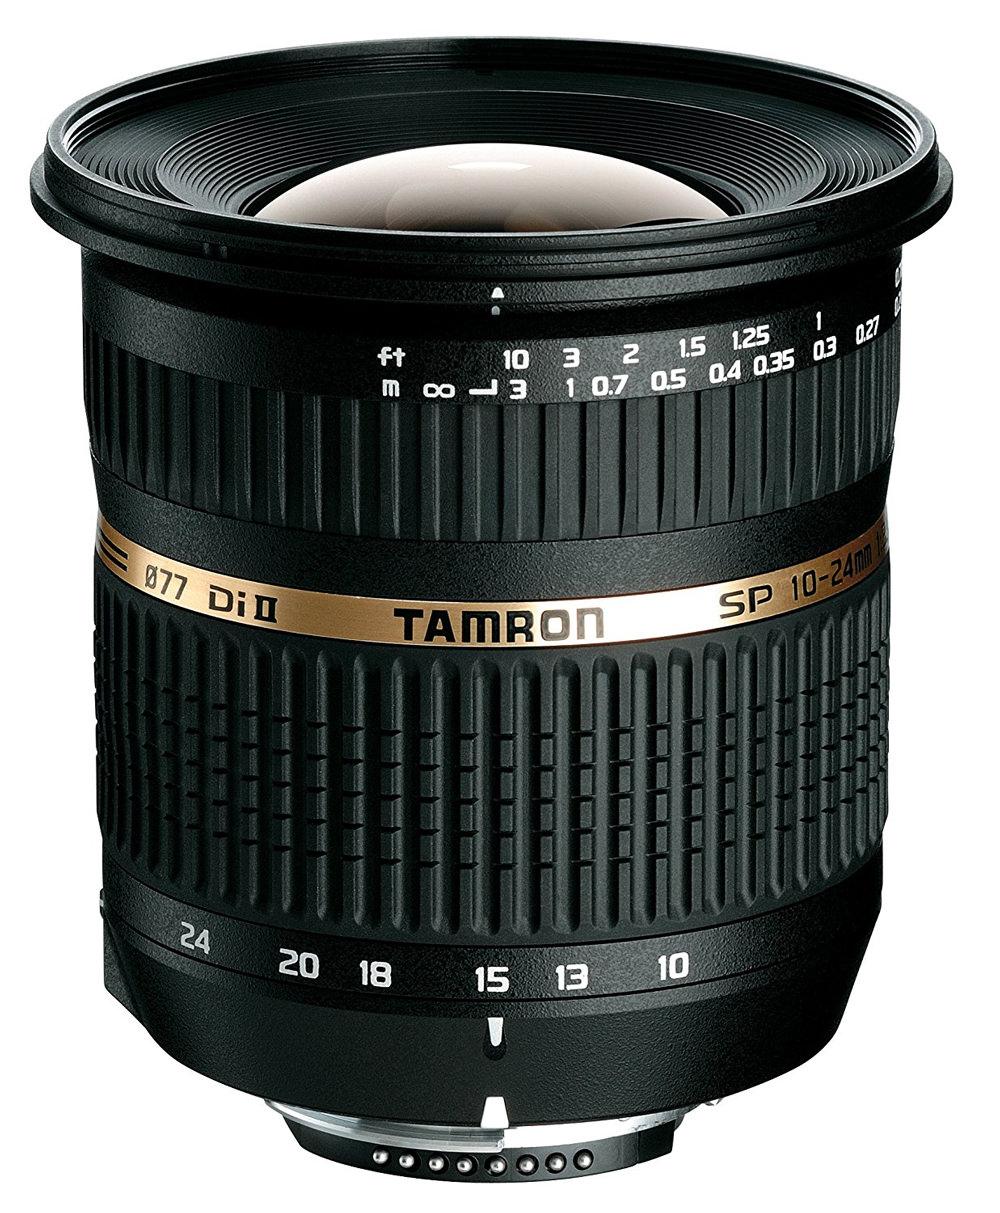 Tamron SP AF 10-24mm F/3.5-4.5 Di II LD Aspherical Lens